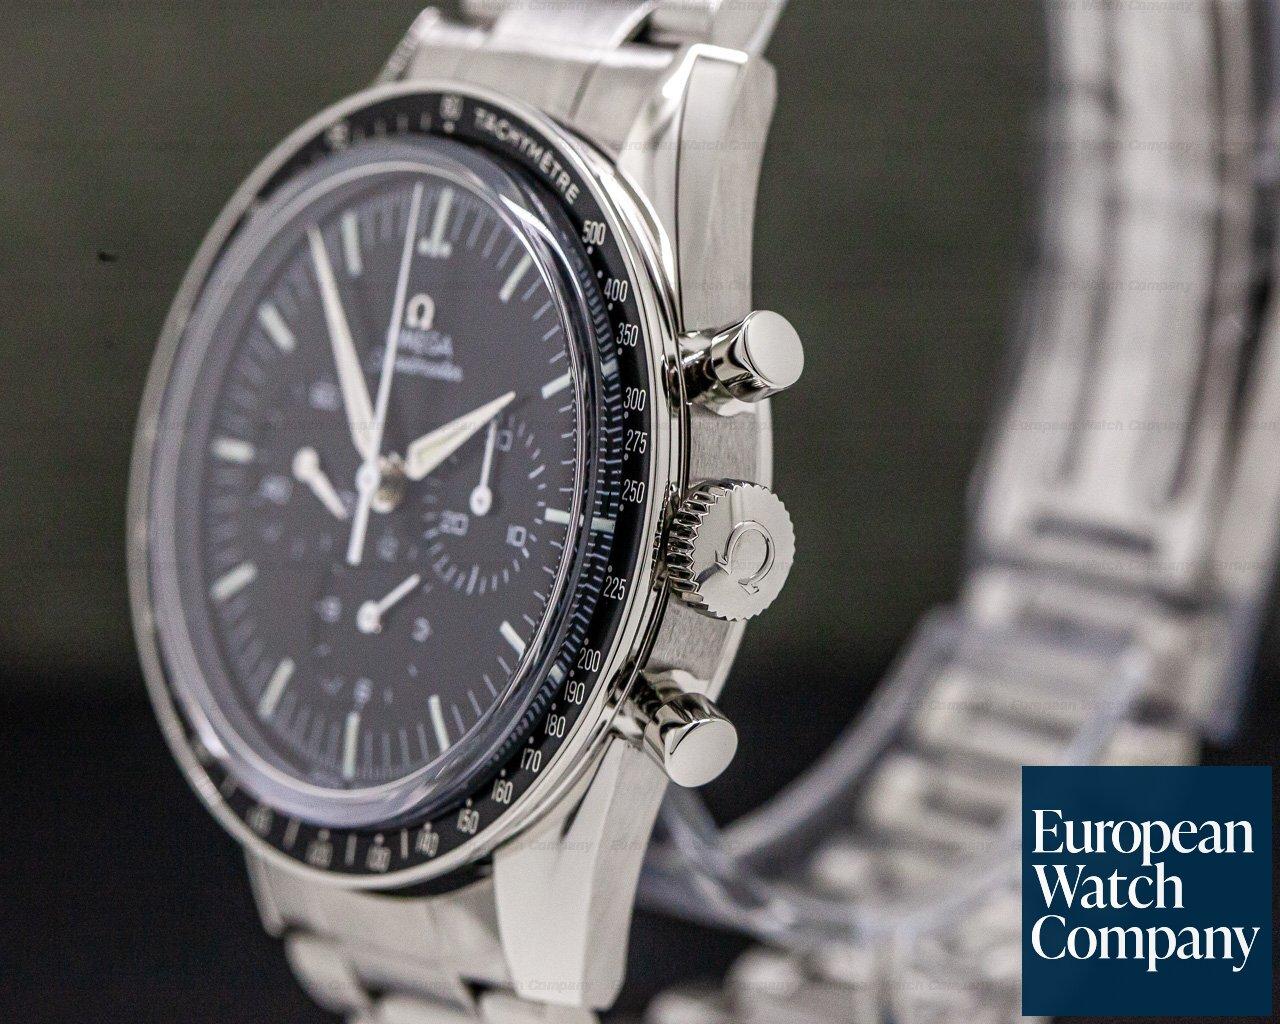 Omega 311.32.40.30.01.001 Speedmaster Professional Numbered Edition + Bracelet